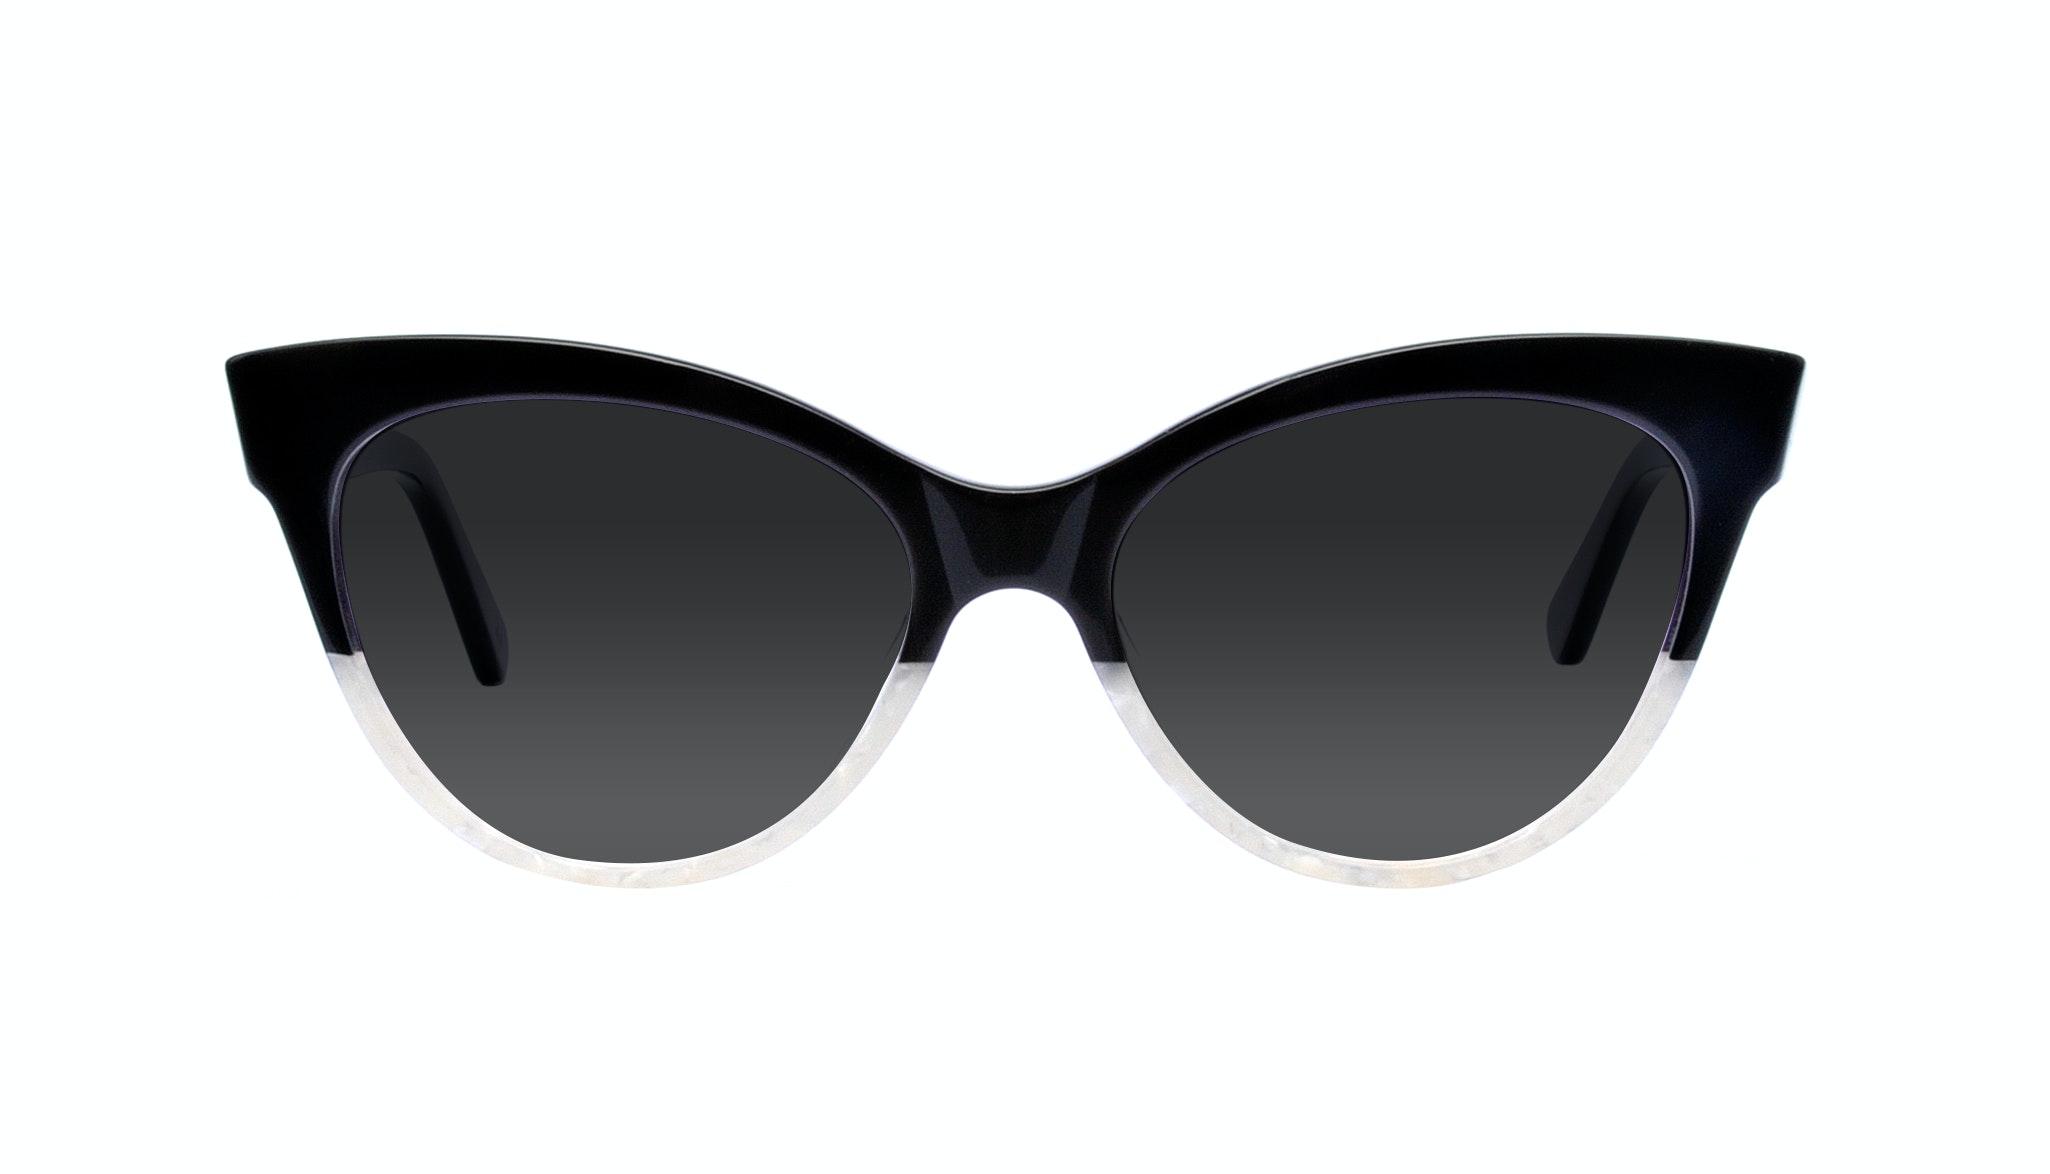 Affordable Fashion Glasses Cat Eye Sunglasses Women SkunkBoy Panda Pearl